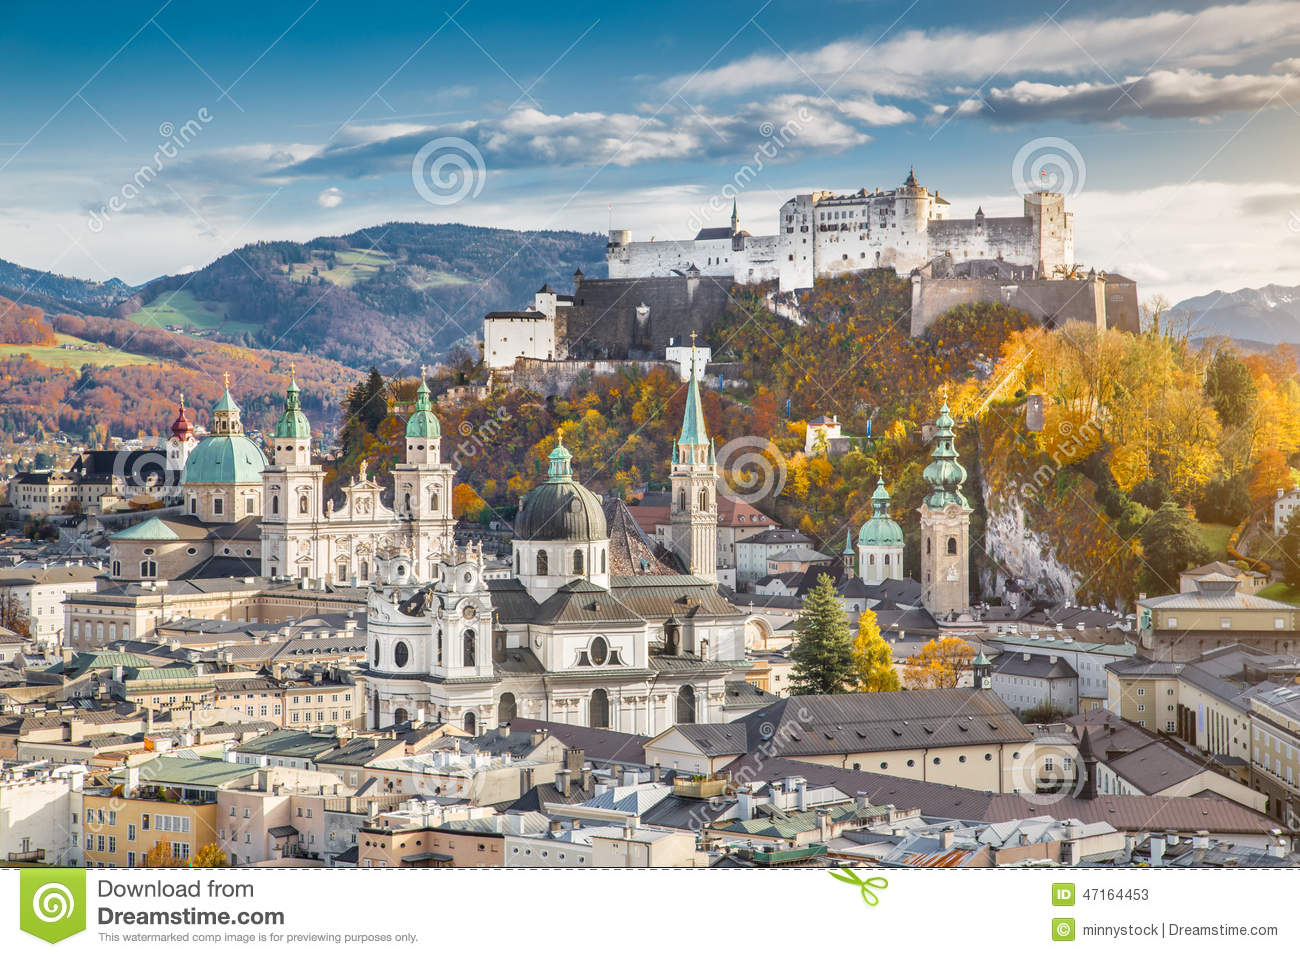 Historic City Of Salzburg In Fall, Austria Stock Photo.